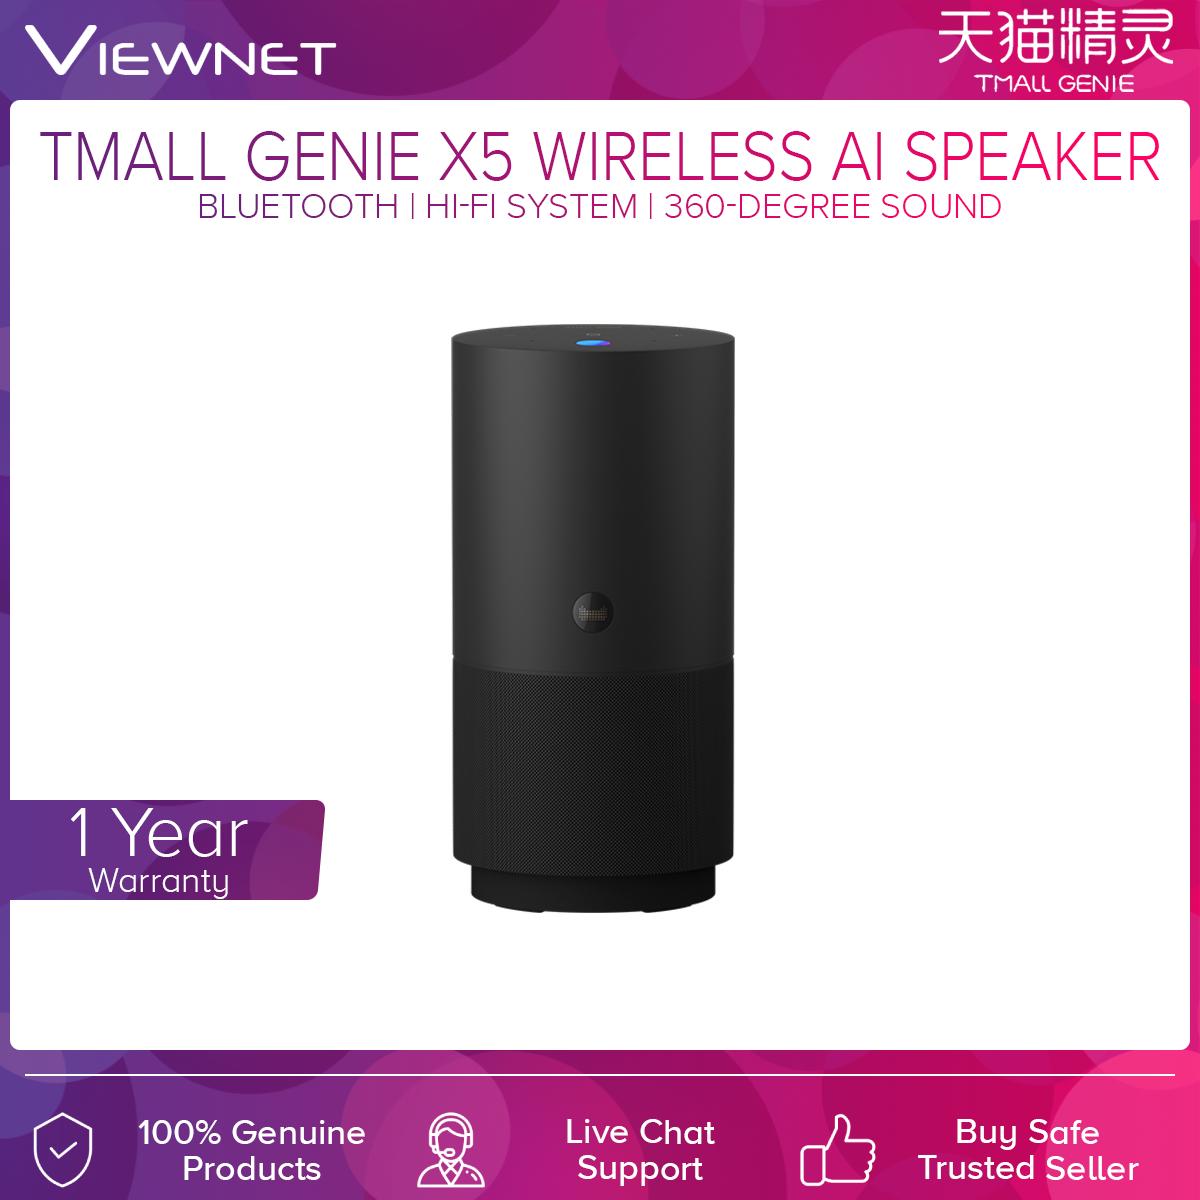 TMALL Genie 天猫精灵 X5 Wireless AI Speaker with Bluetooth, Hi-Fi System, 360-degree Sound